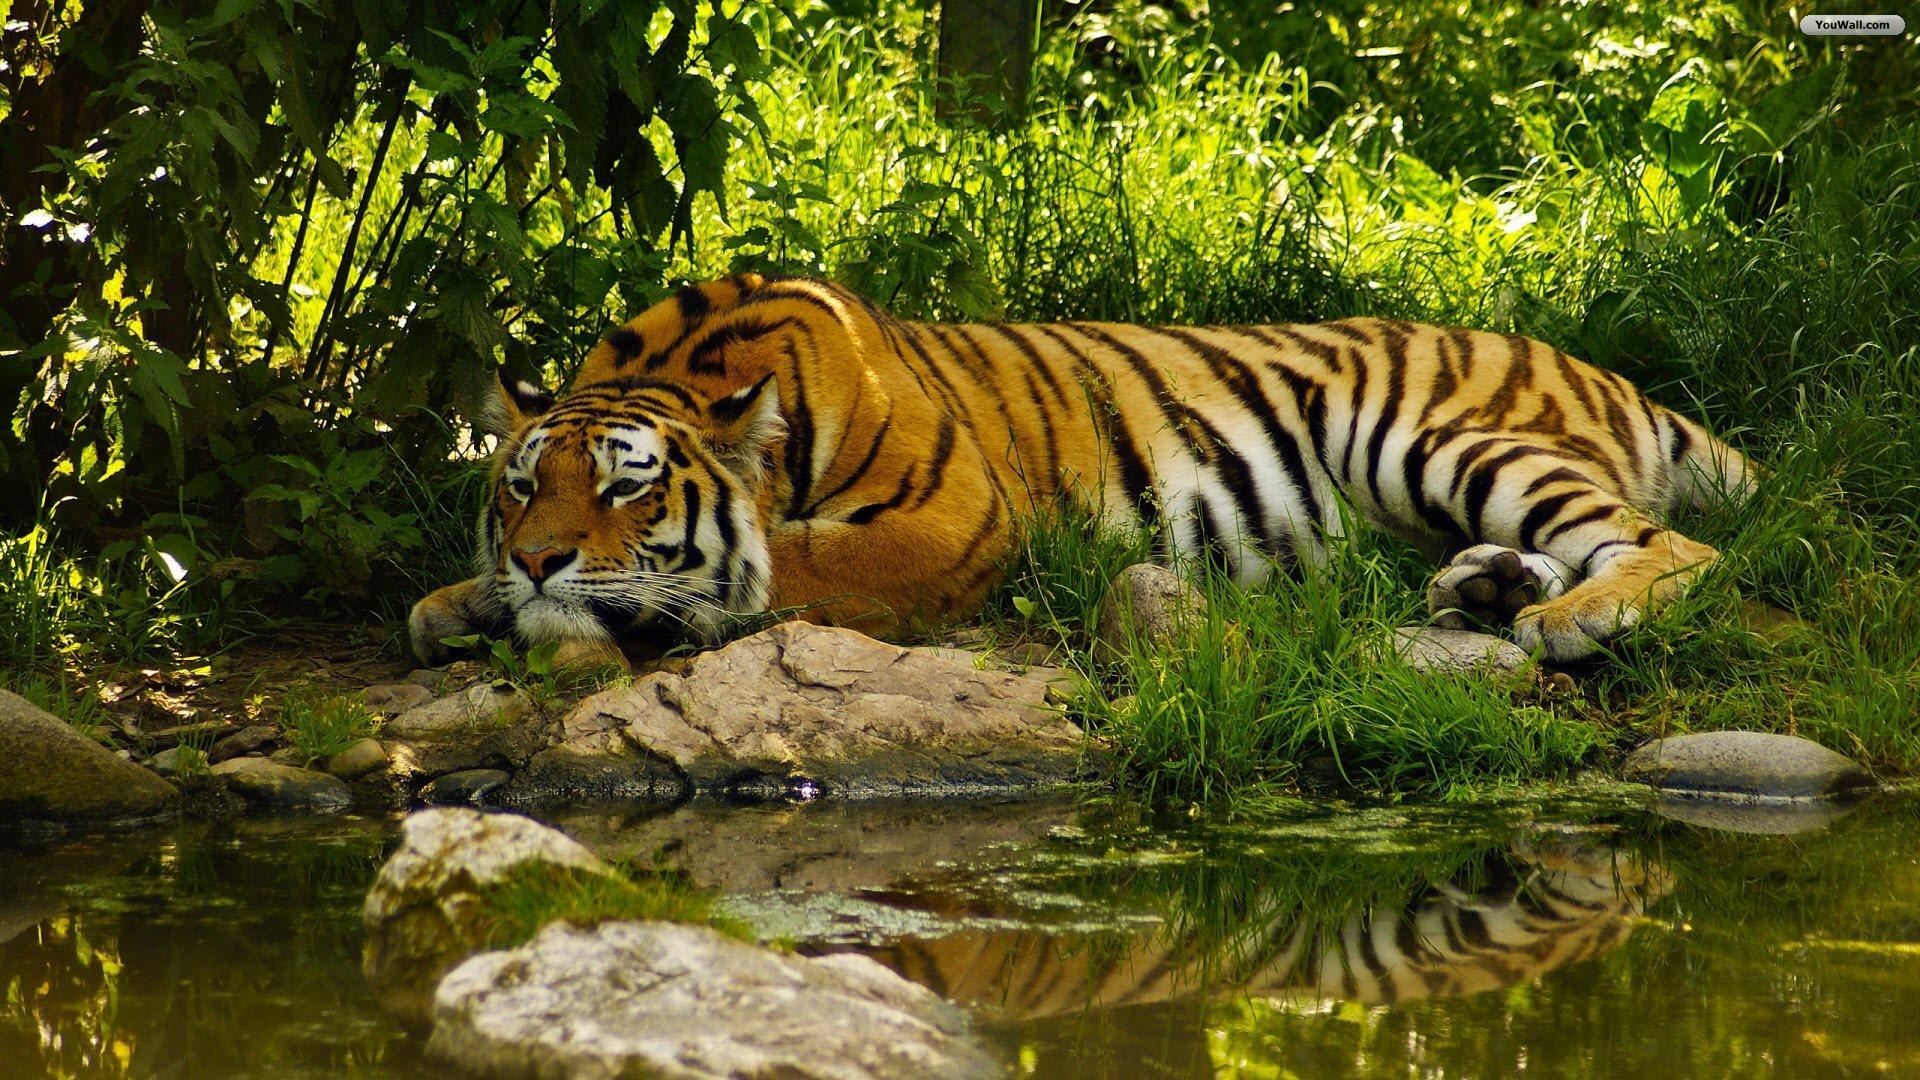 Tiger Full Hd Wallpaper Desktop Backgrounds Free Download 1920x1080